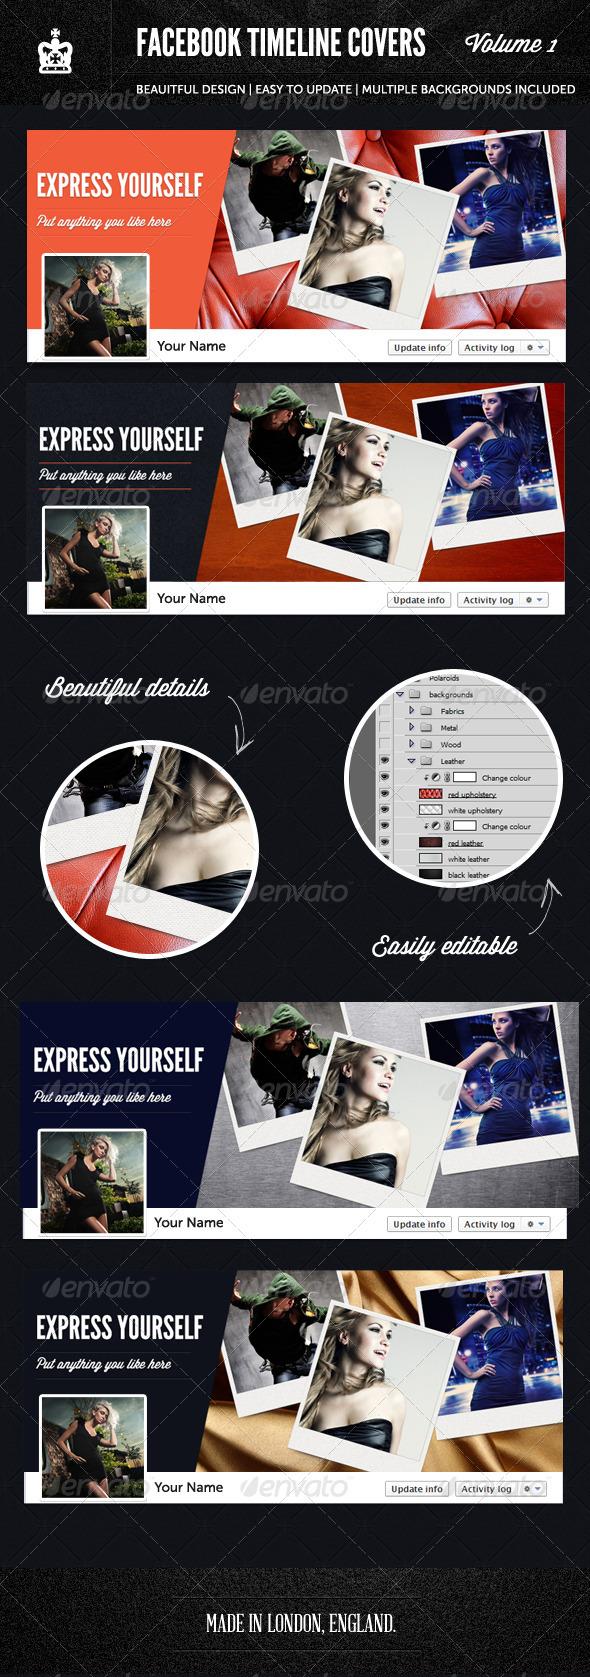 Facebook Timeline Covers - 1st Edition - Facebook Timeline Covers Social Media